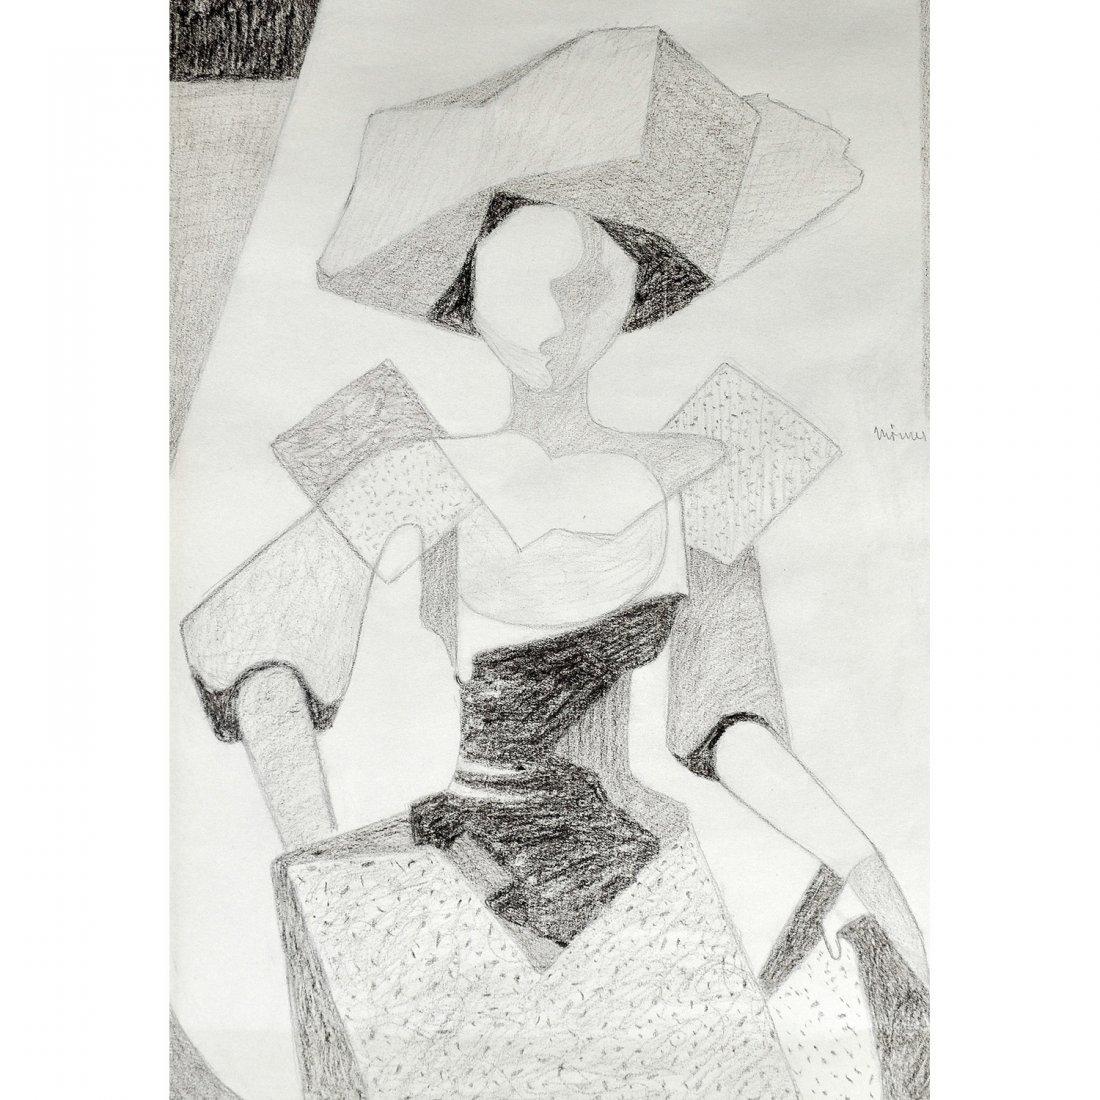 17: STELLAN MÖRNER (1896-1979), skiss